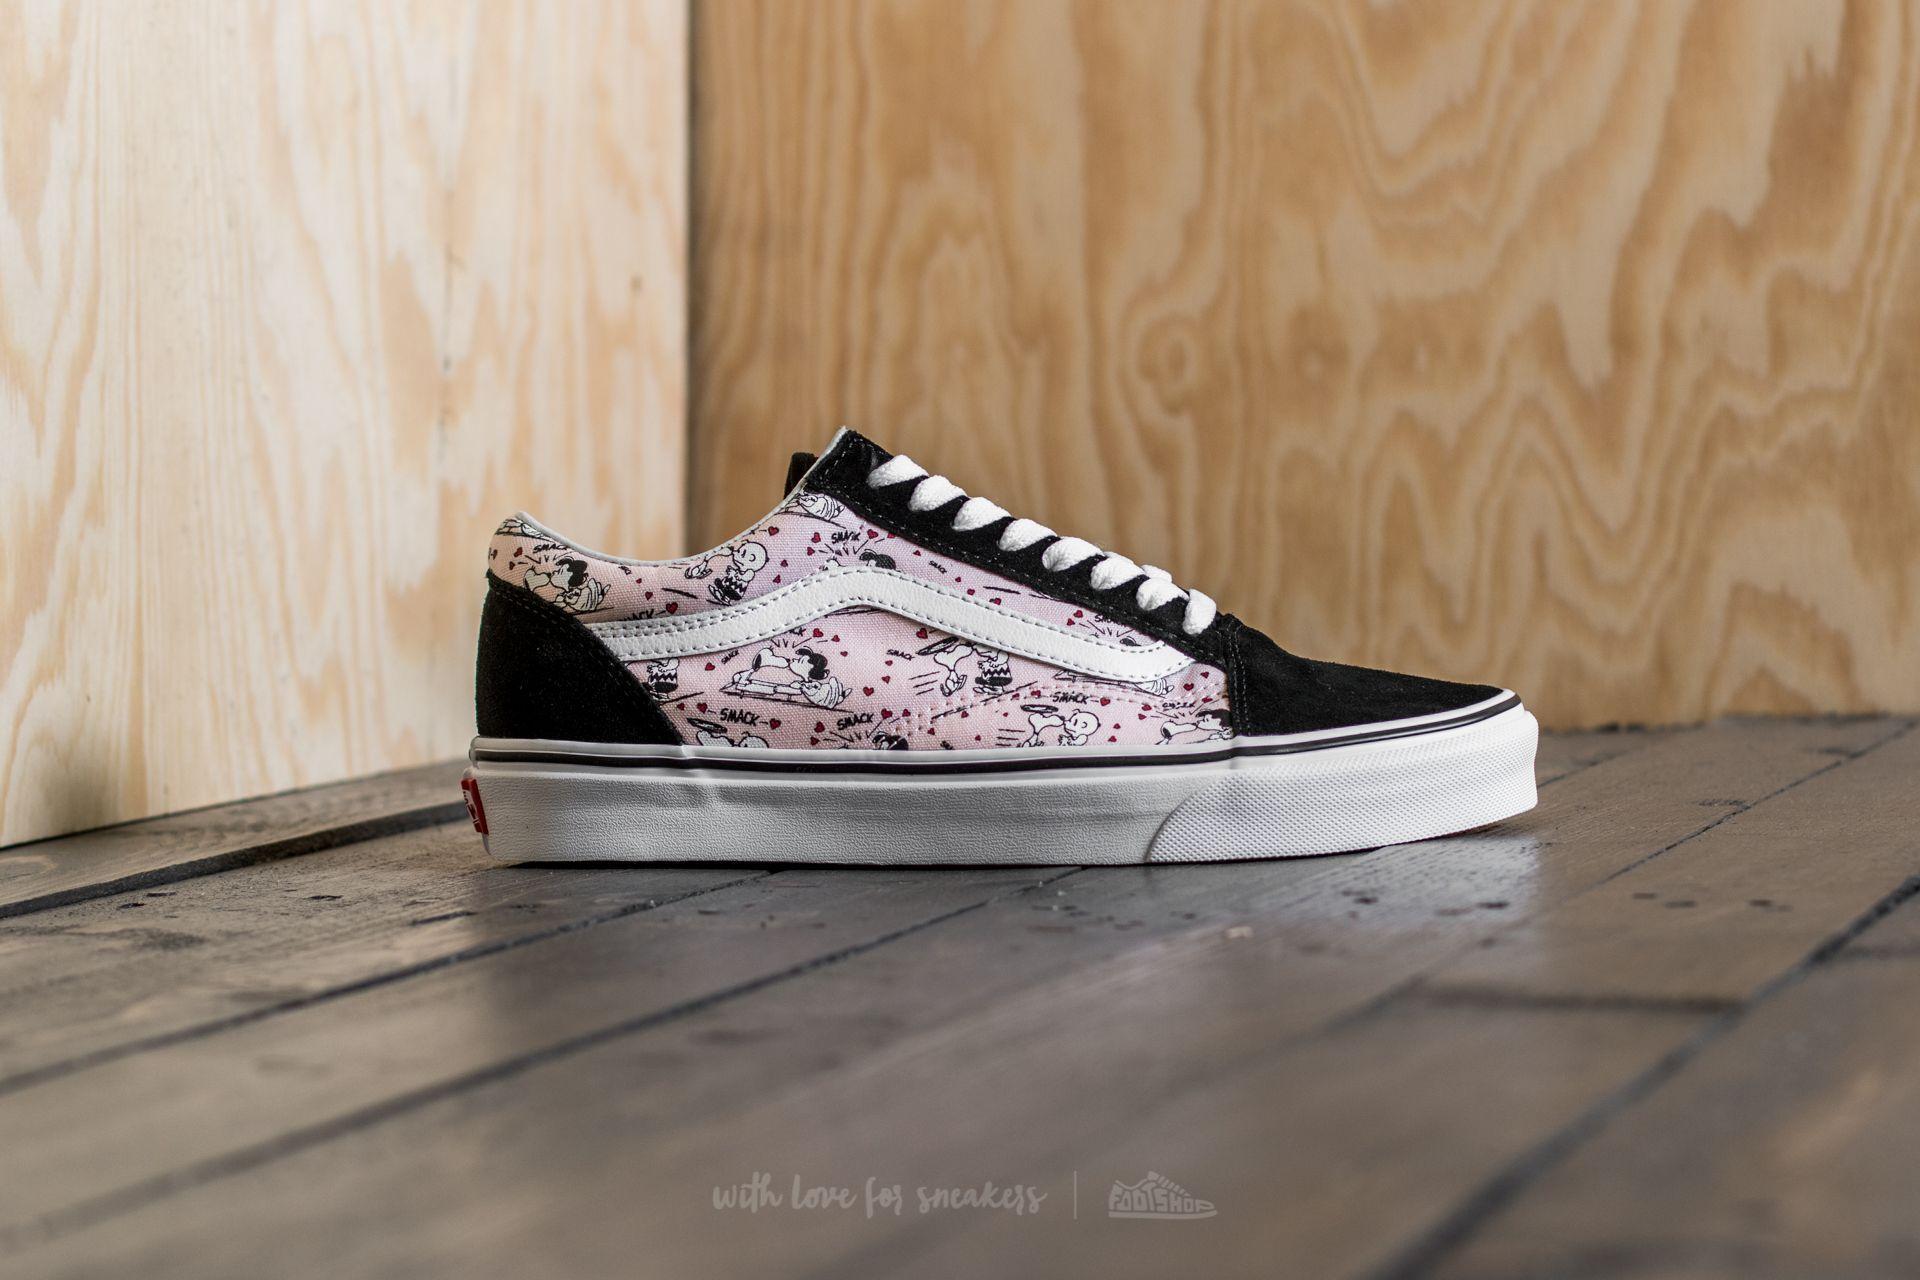 966c5c9aabf9 Lyst - Vans X Peanuts Old Skool Smack  Pearl